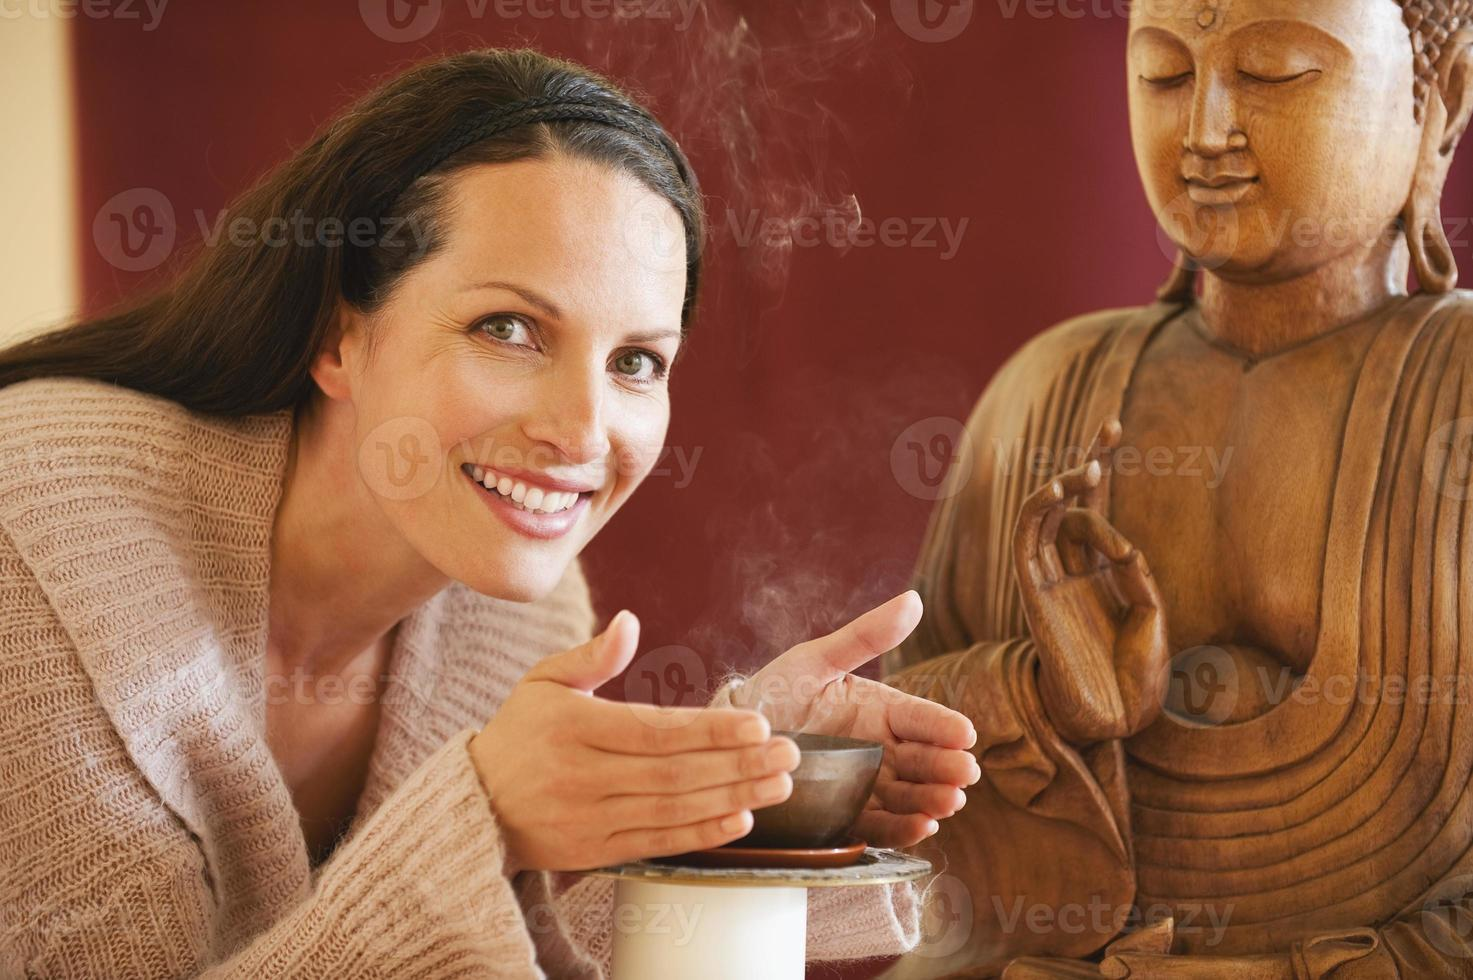 Brunette woman enjoying joss stick's scent buddha statue in background photo